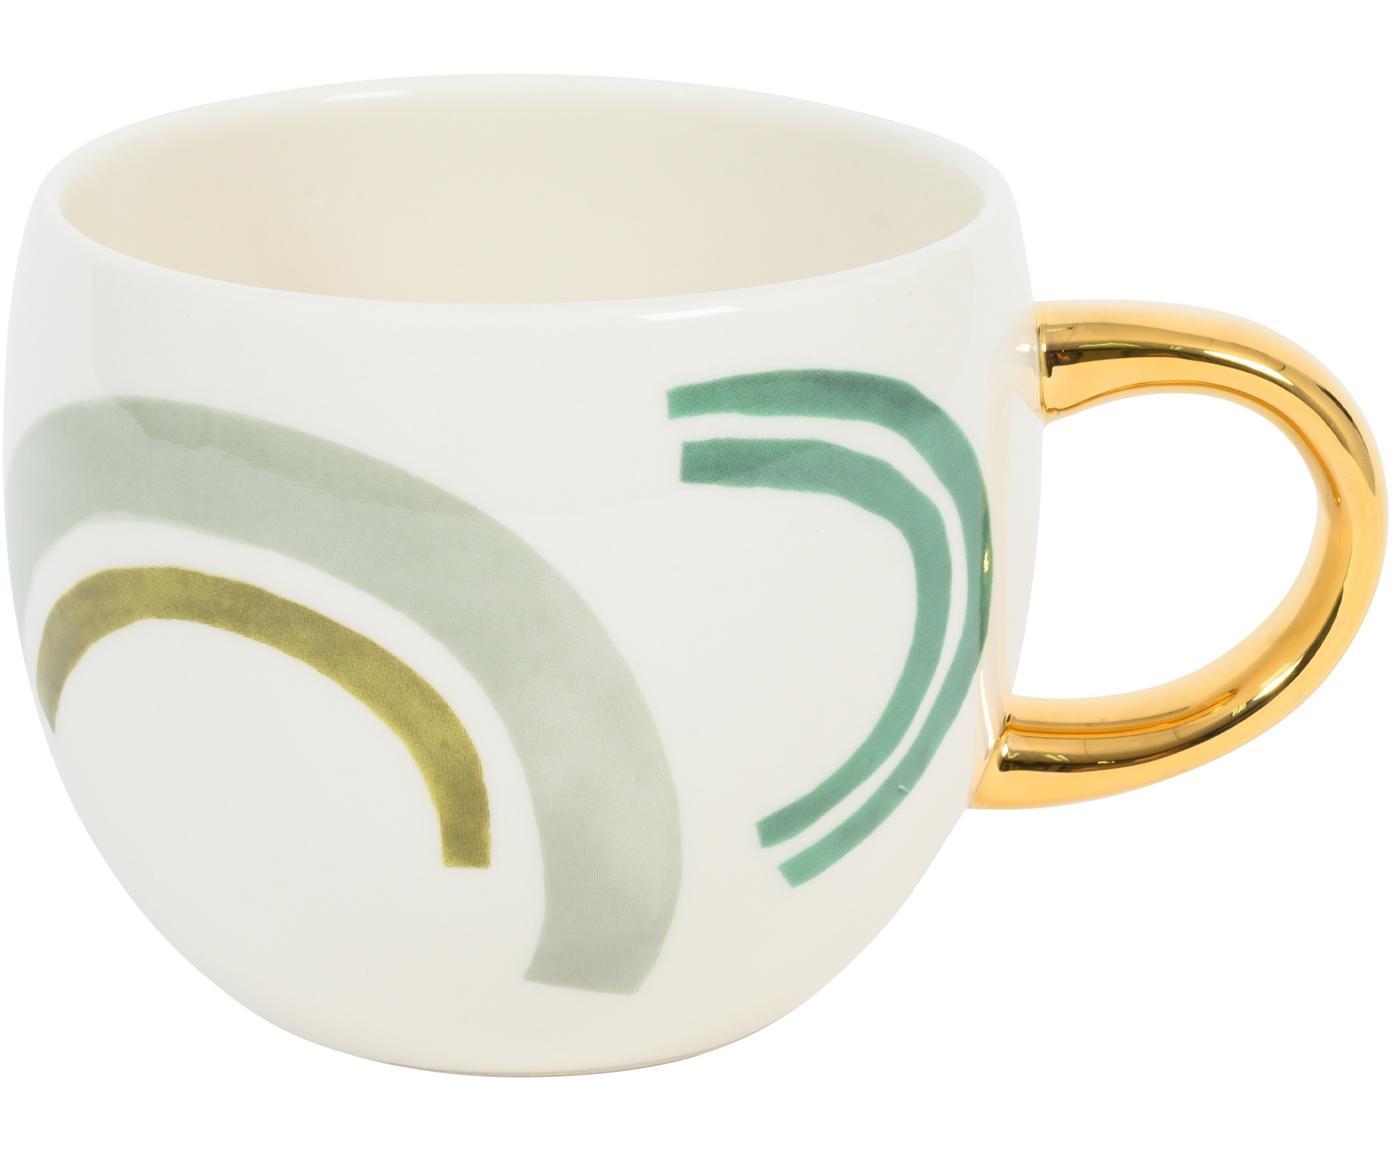 Kávová šálka so zlatou úchytkou Bounce, Viacfarebná